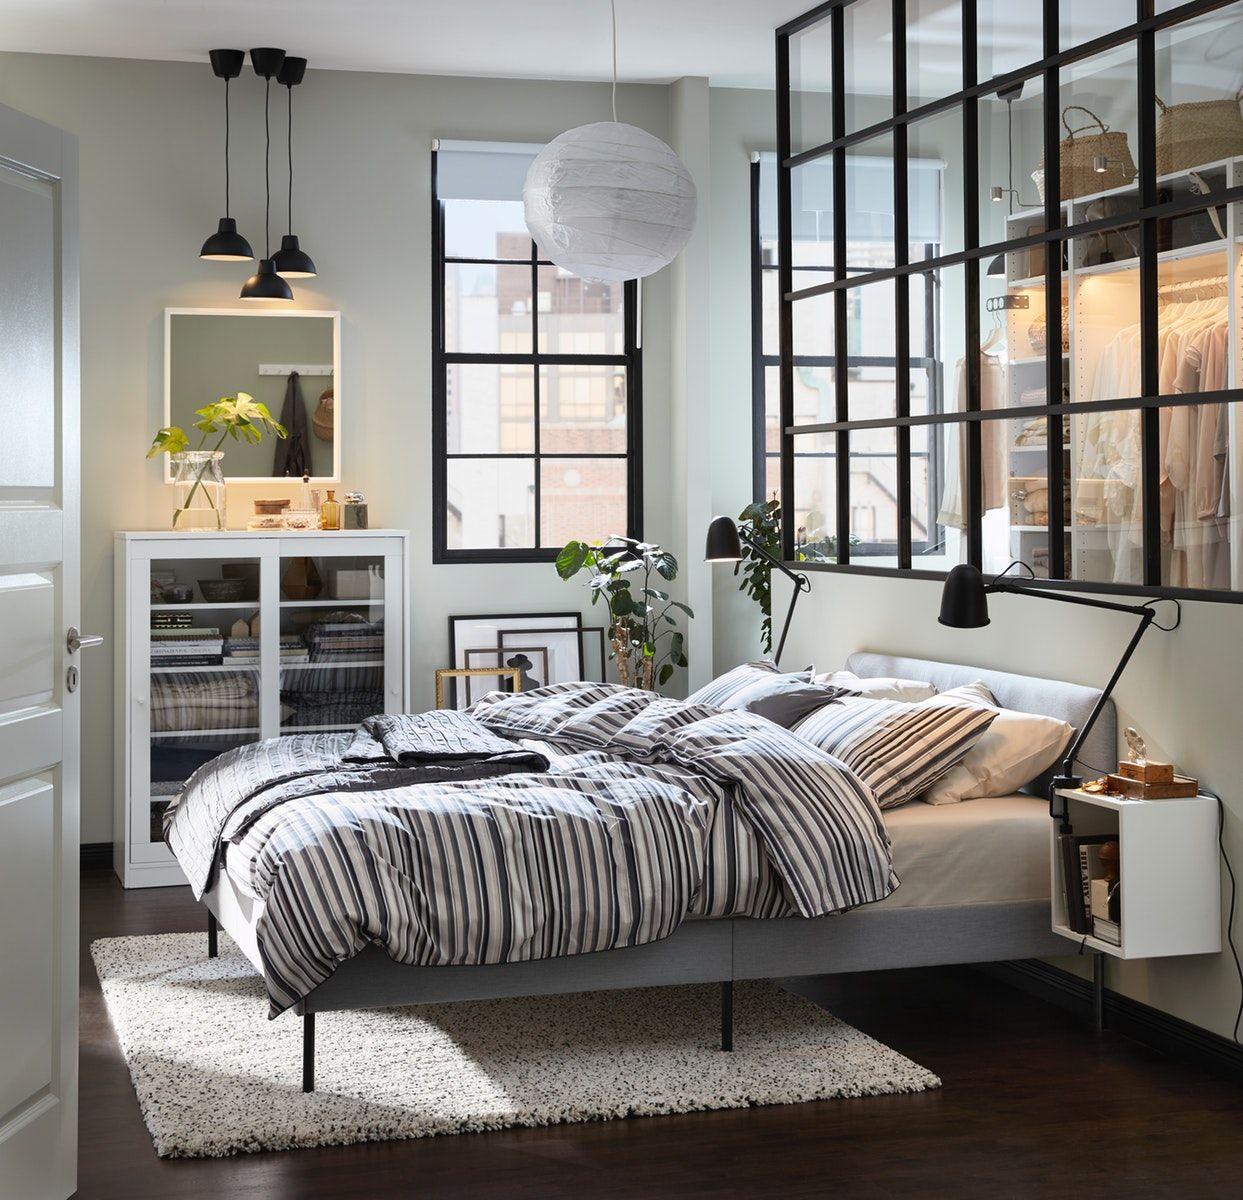 Pin By Ikea Baltics On Ikea Catalog 2020 Organize Your Bedroom